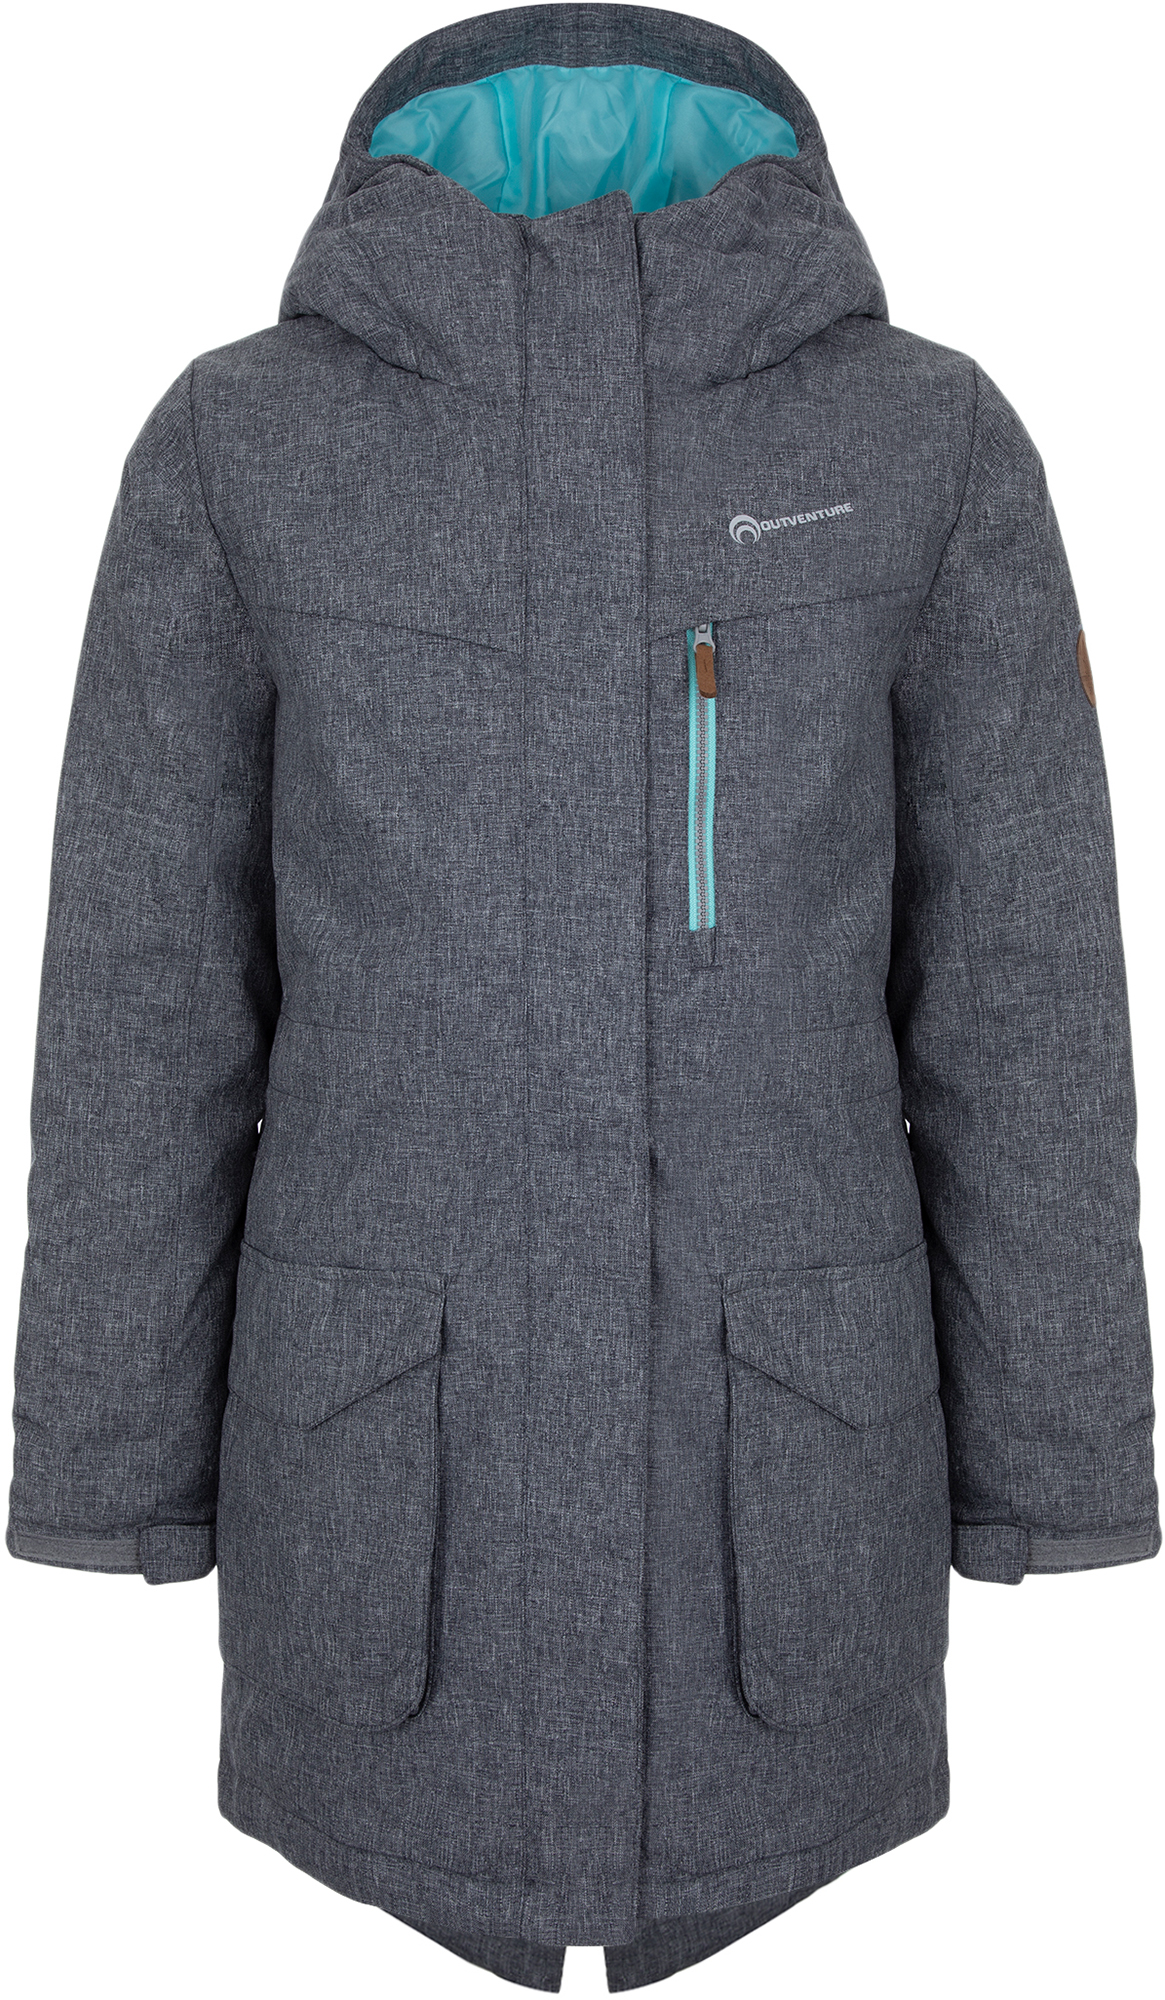 Outventure Куртка утепленная для девочек Outventure, размер 164 куртка для девочек atplay цвет серый 1jk803 размер 86